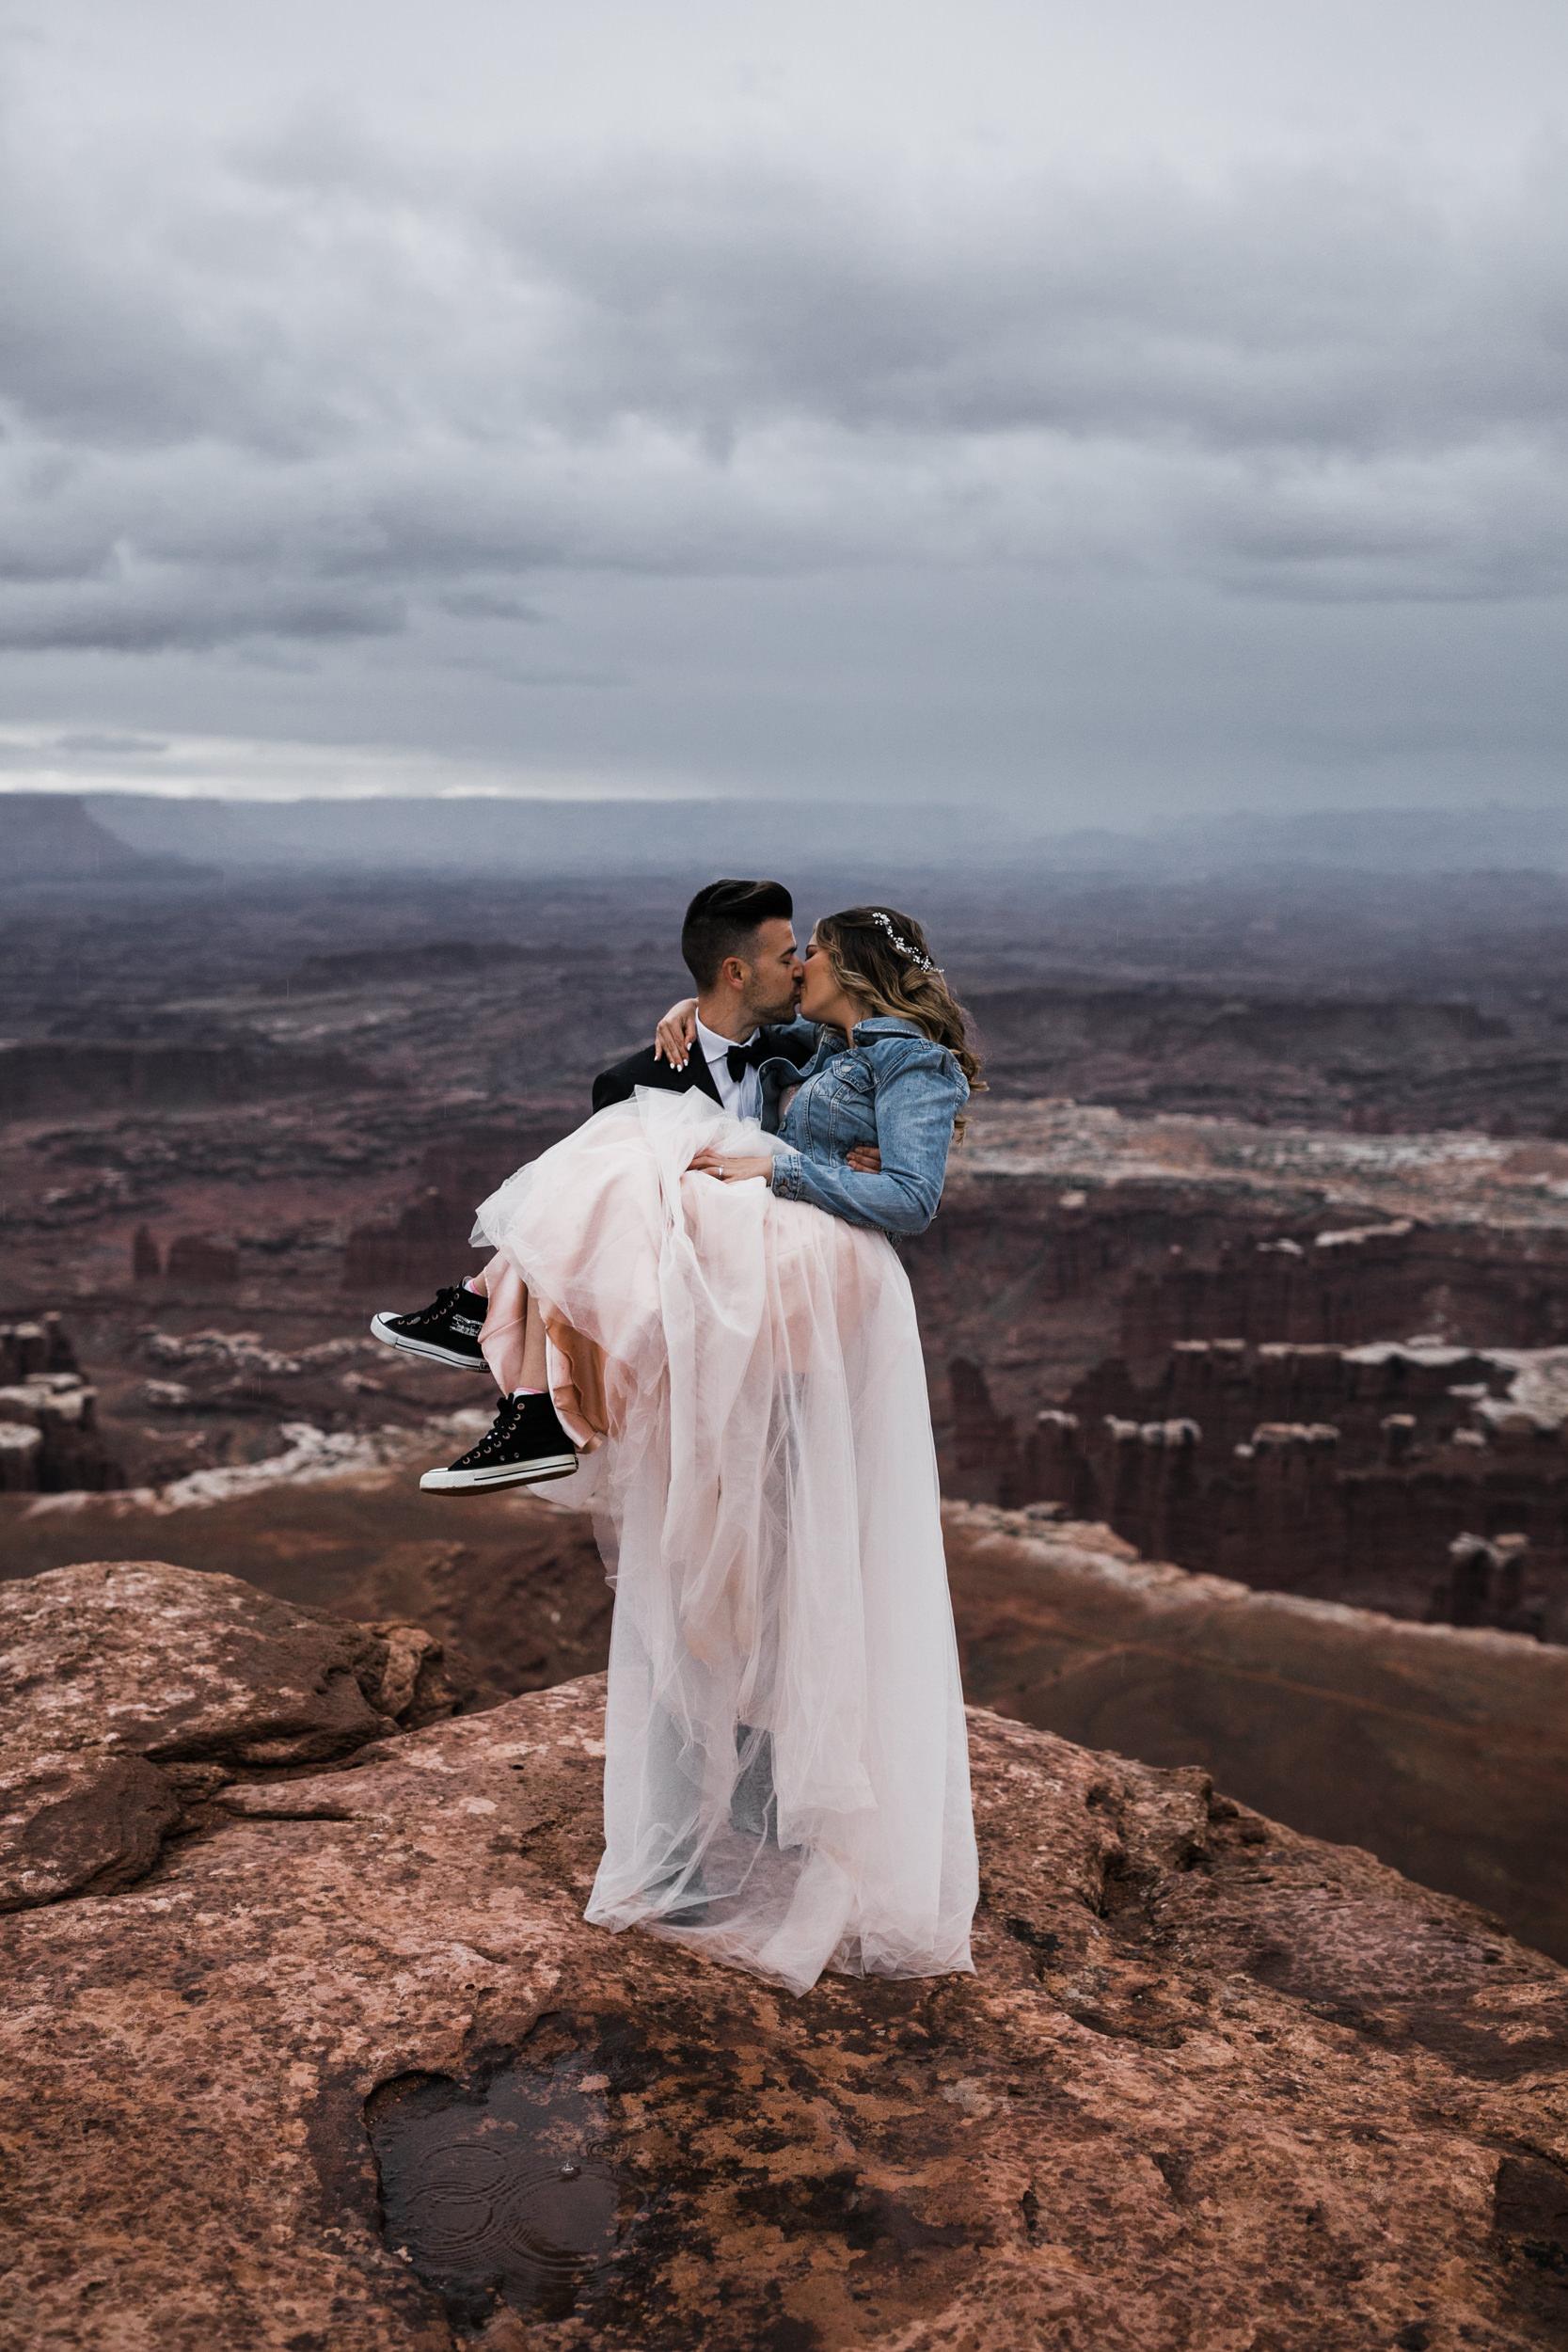 Hearnes-Elopement-Photography-Canyonlands-National-Park-Moab-Wedding-29.jpg